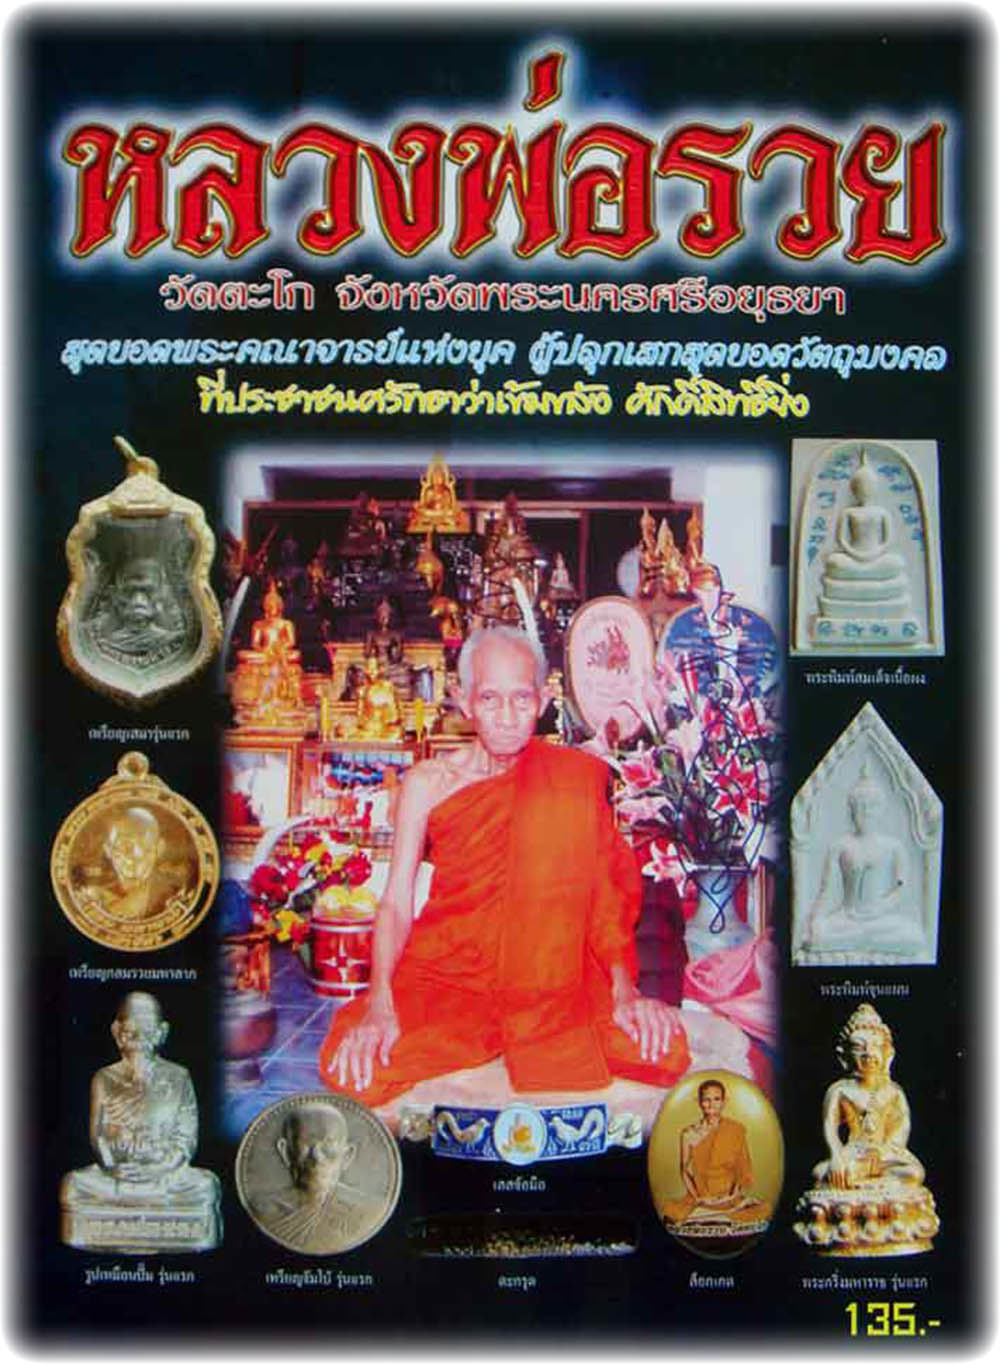 Takrut Tone Mad Daay Akom 7 Sii Wicha Salika - Luang Por Ruay - Wat Tago